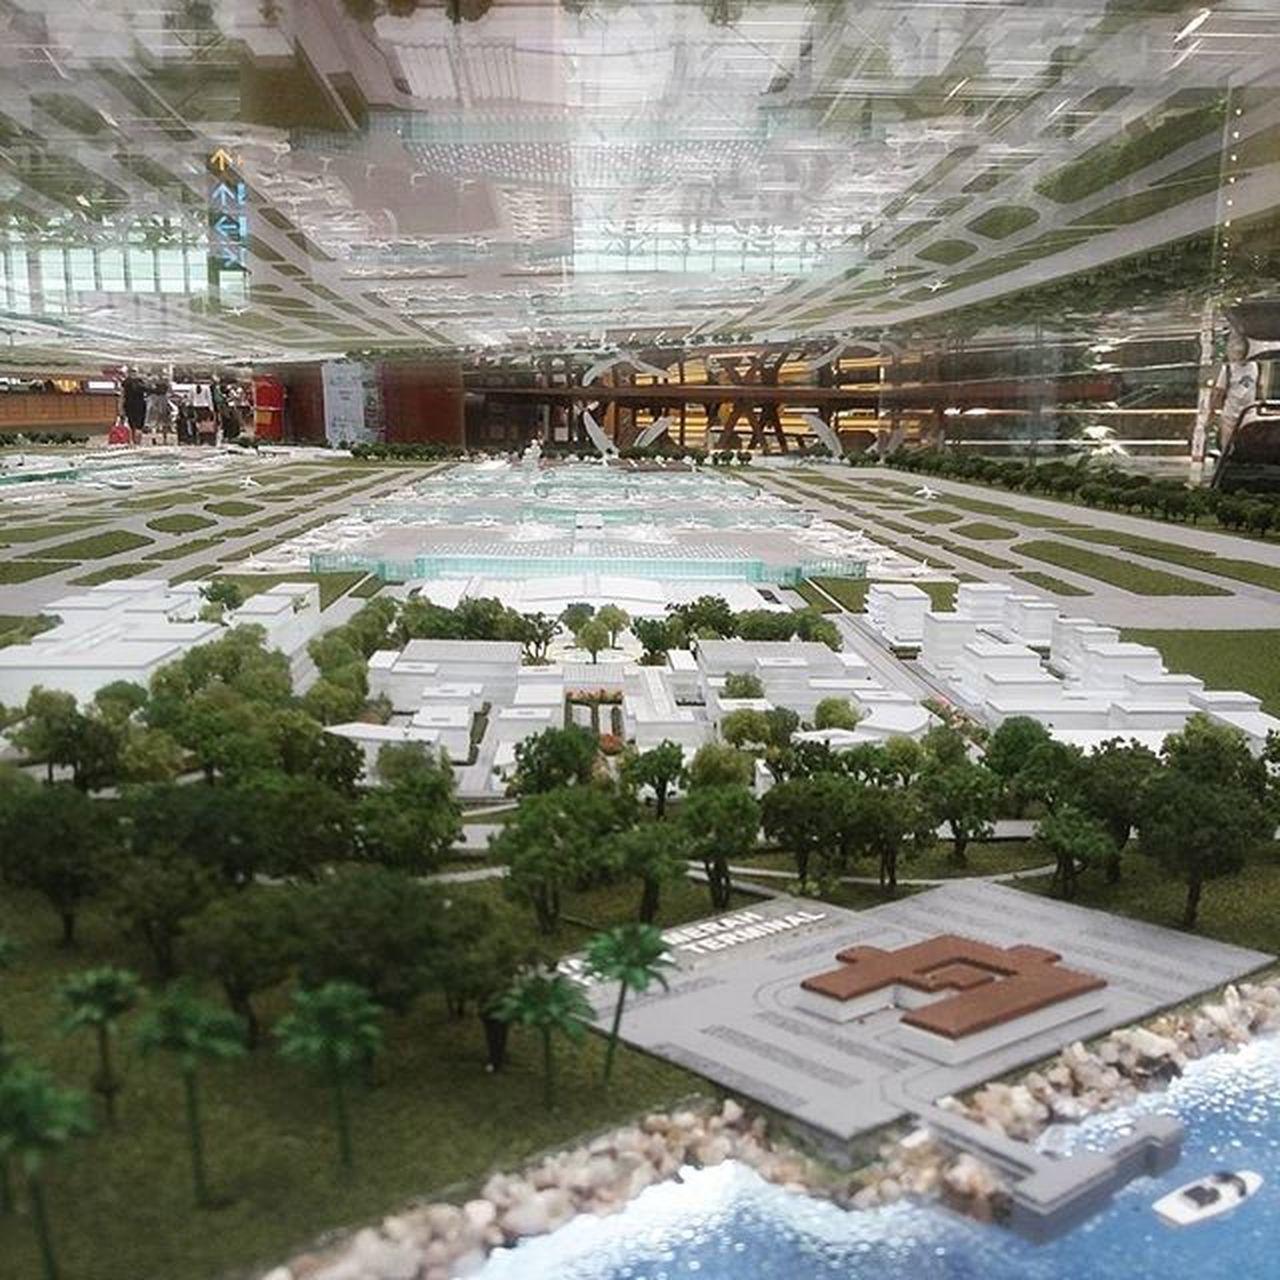 Changiairport T3 T5project Singapore Terminal3 Photooftheday Photooftheweek Photooftheyear